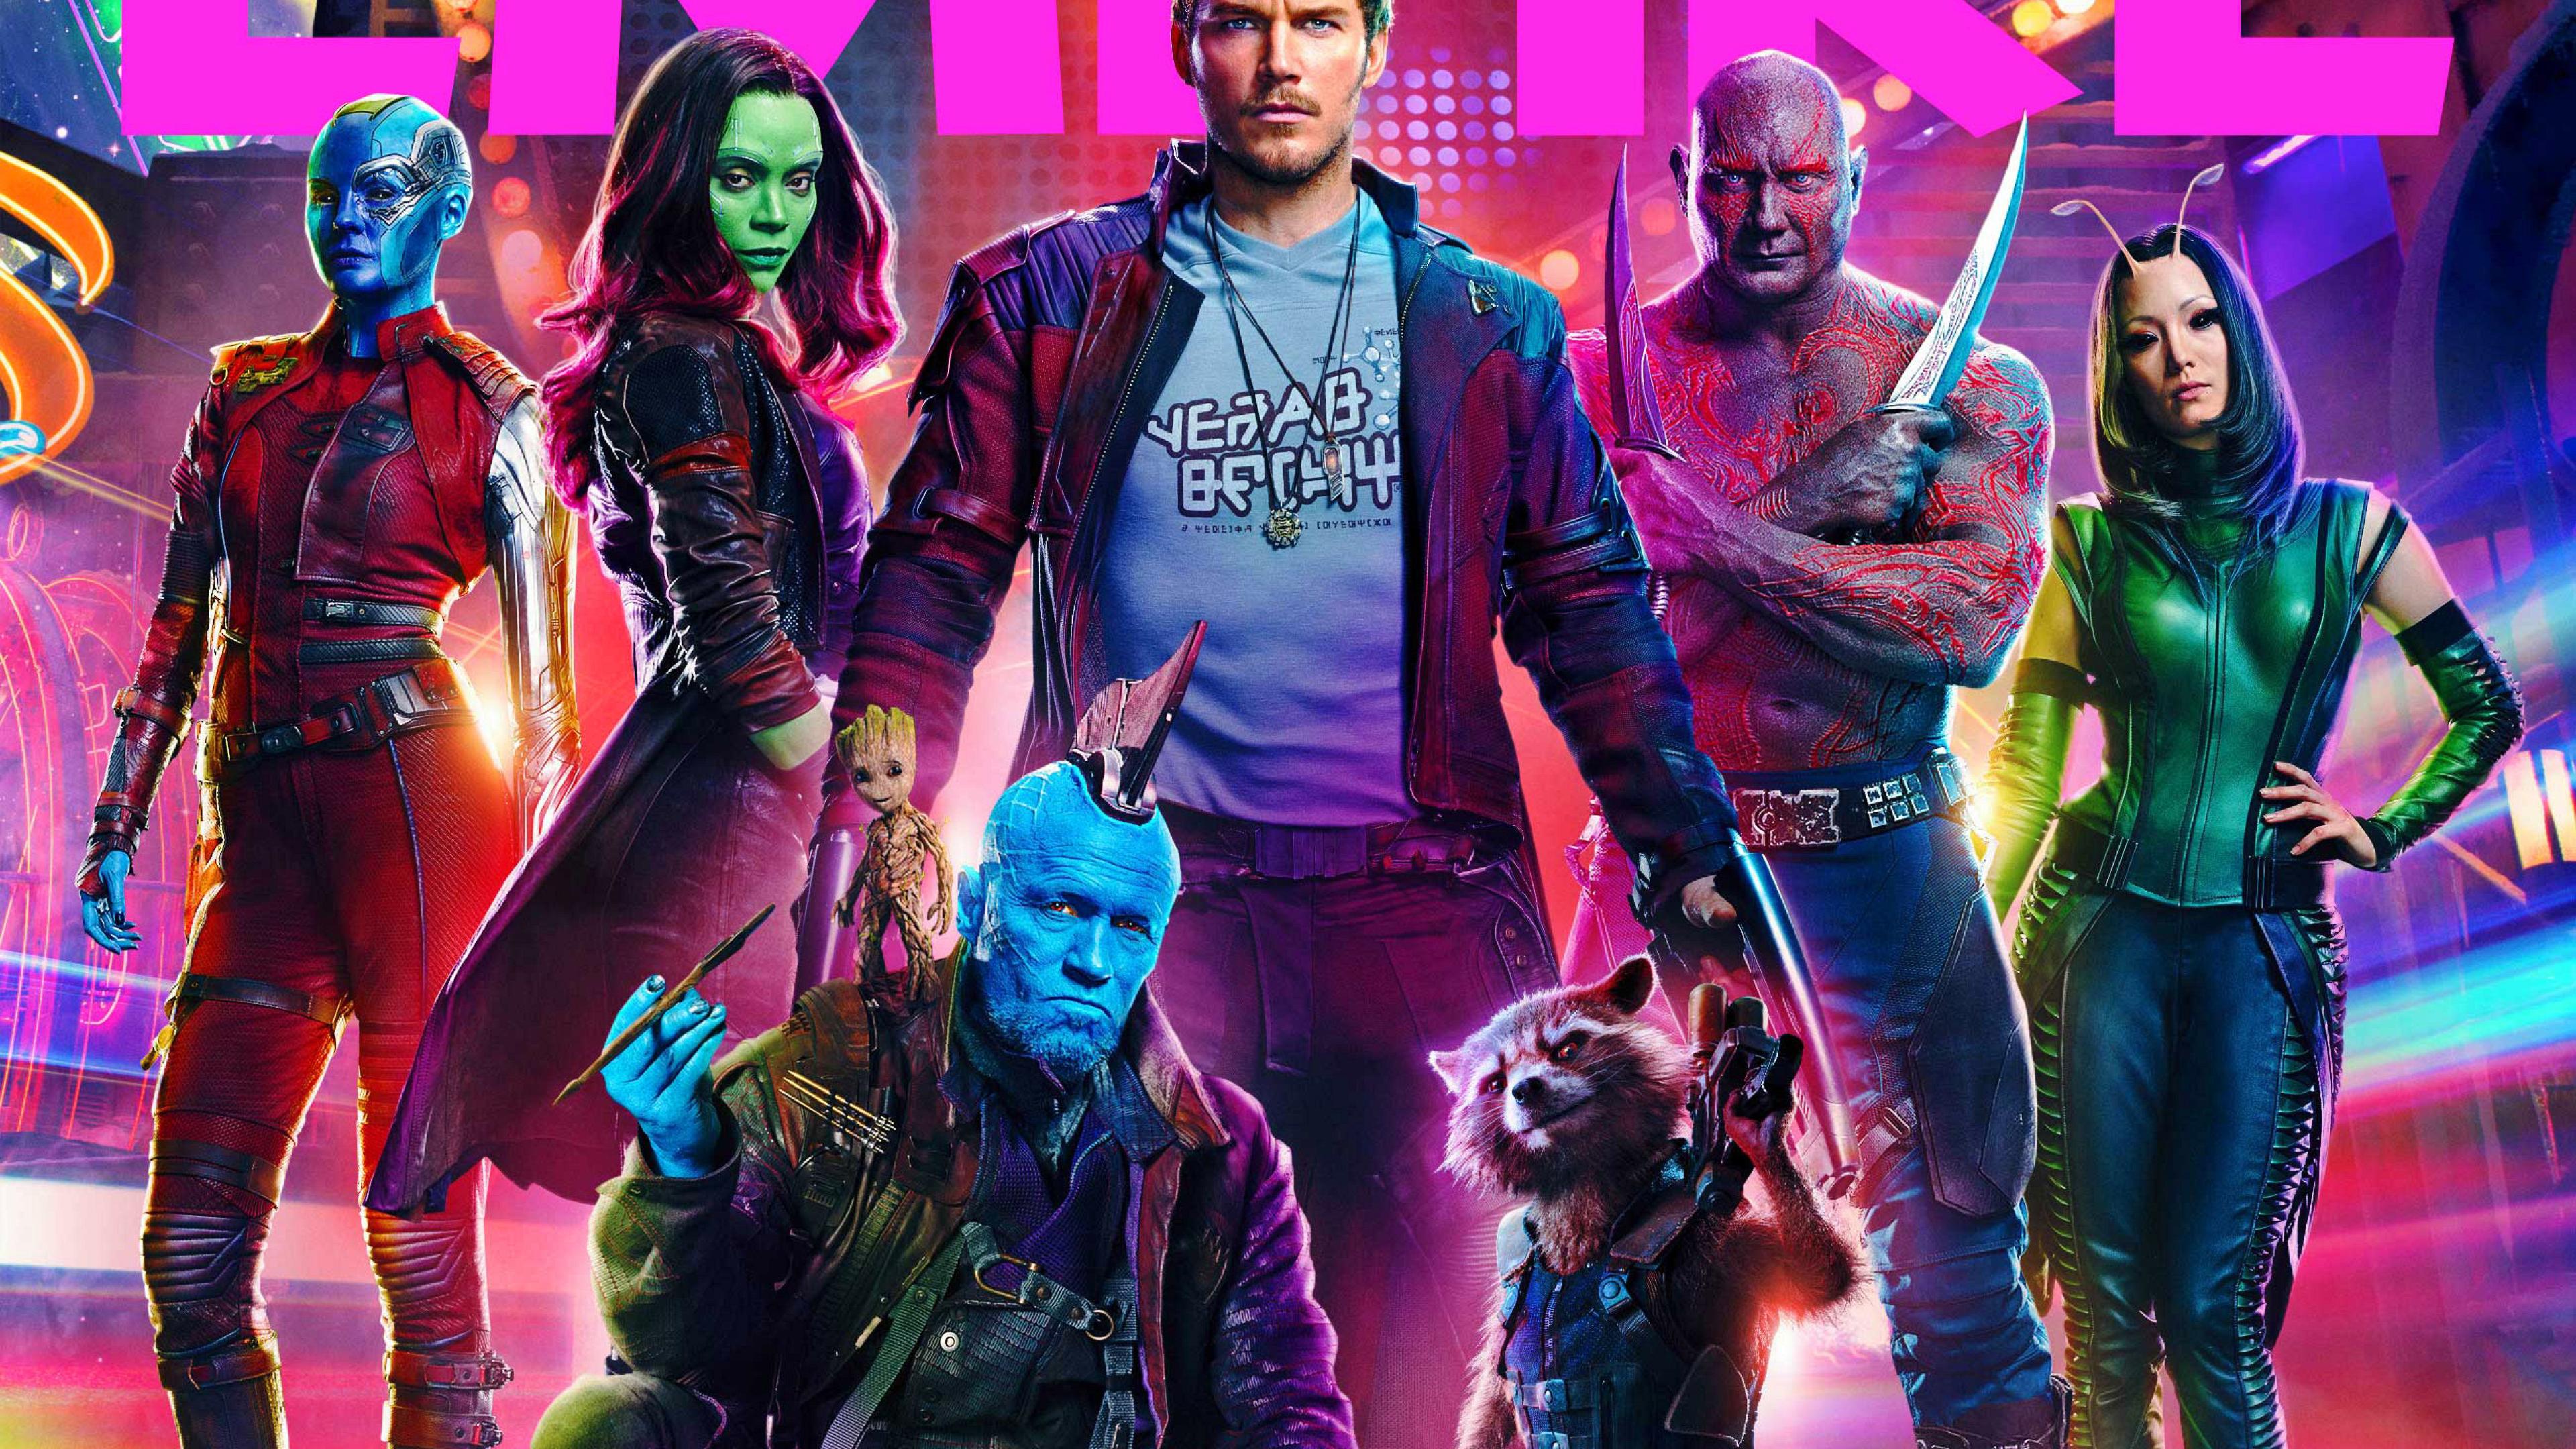 3840x2160 Guardians Of The Galaxy Vol 2 Empire Cover 4k Wallpaper